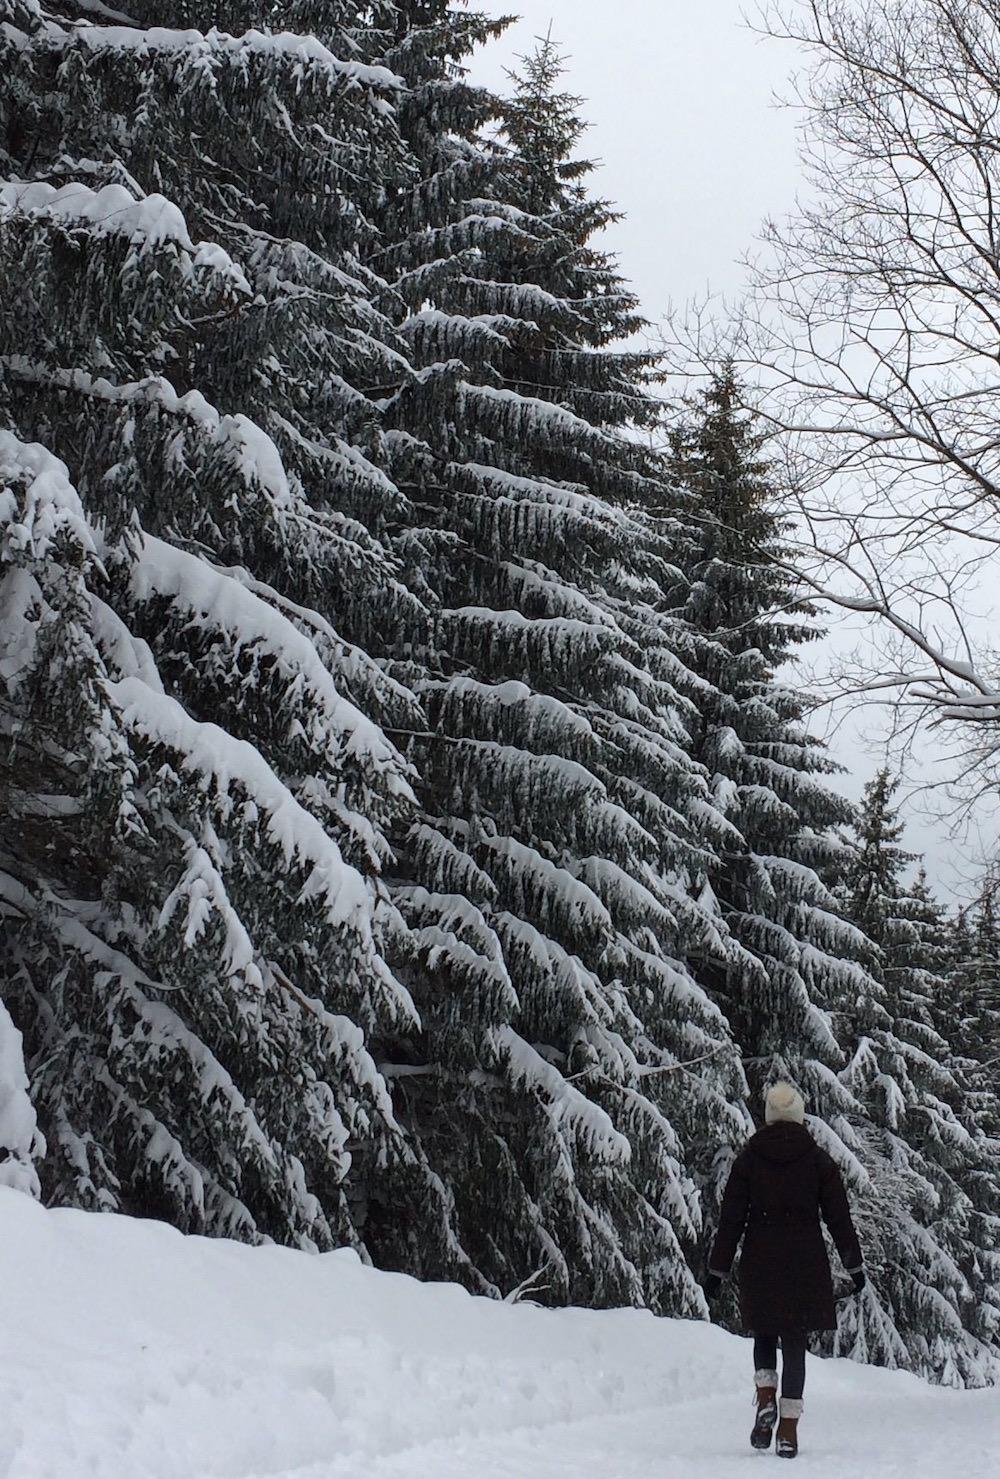 winter wonderland in the Harz mountains germany.jpg